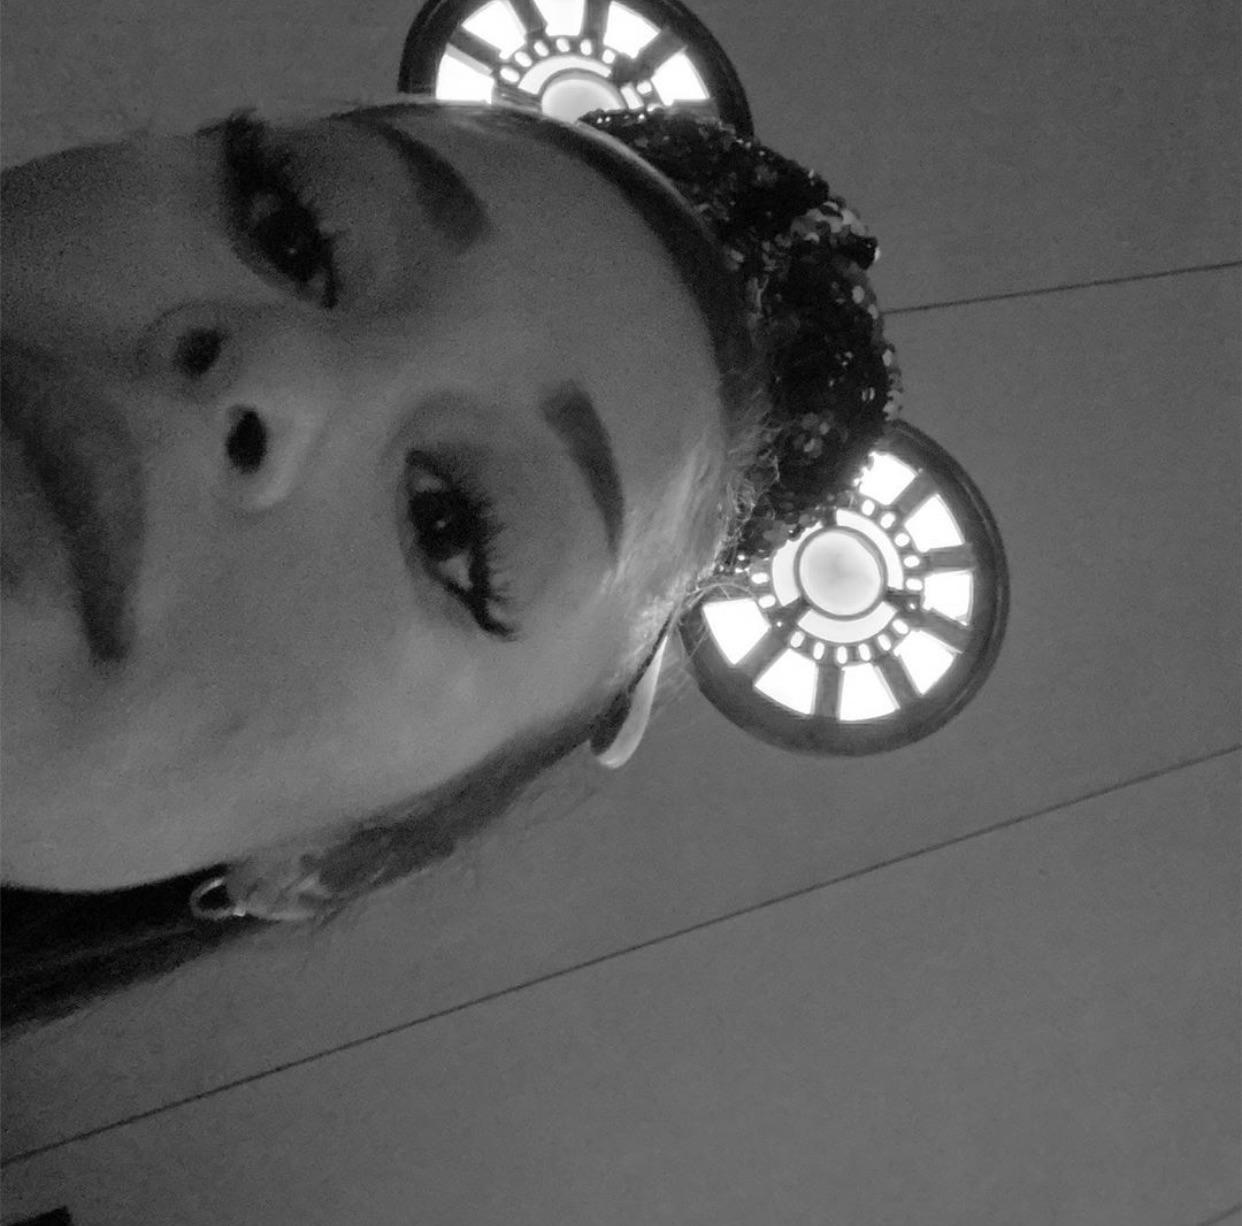 ariana grande, ari, and black and white image